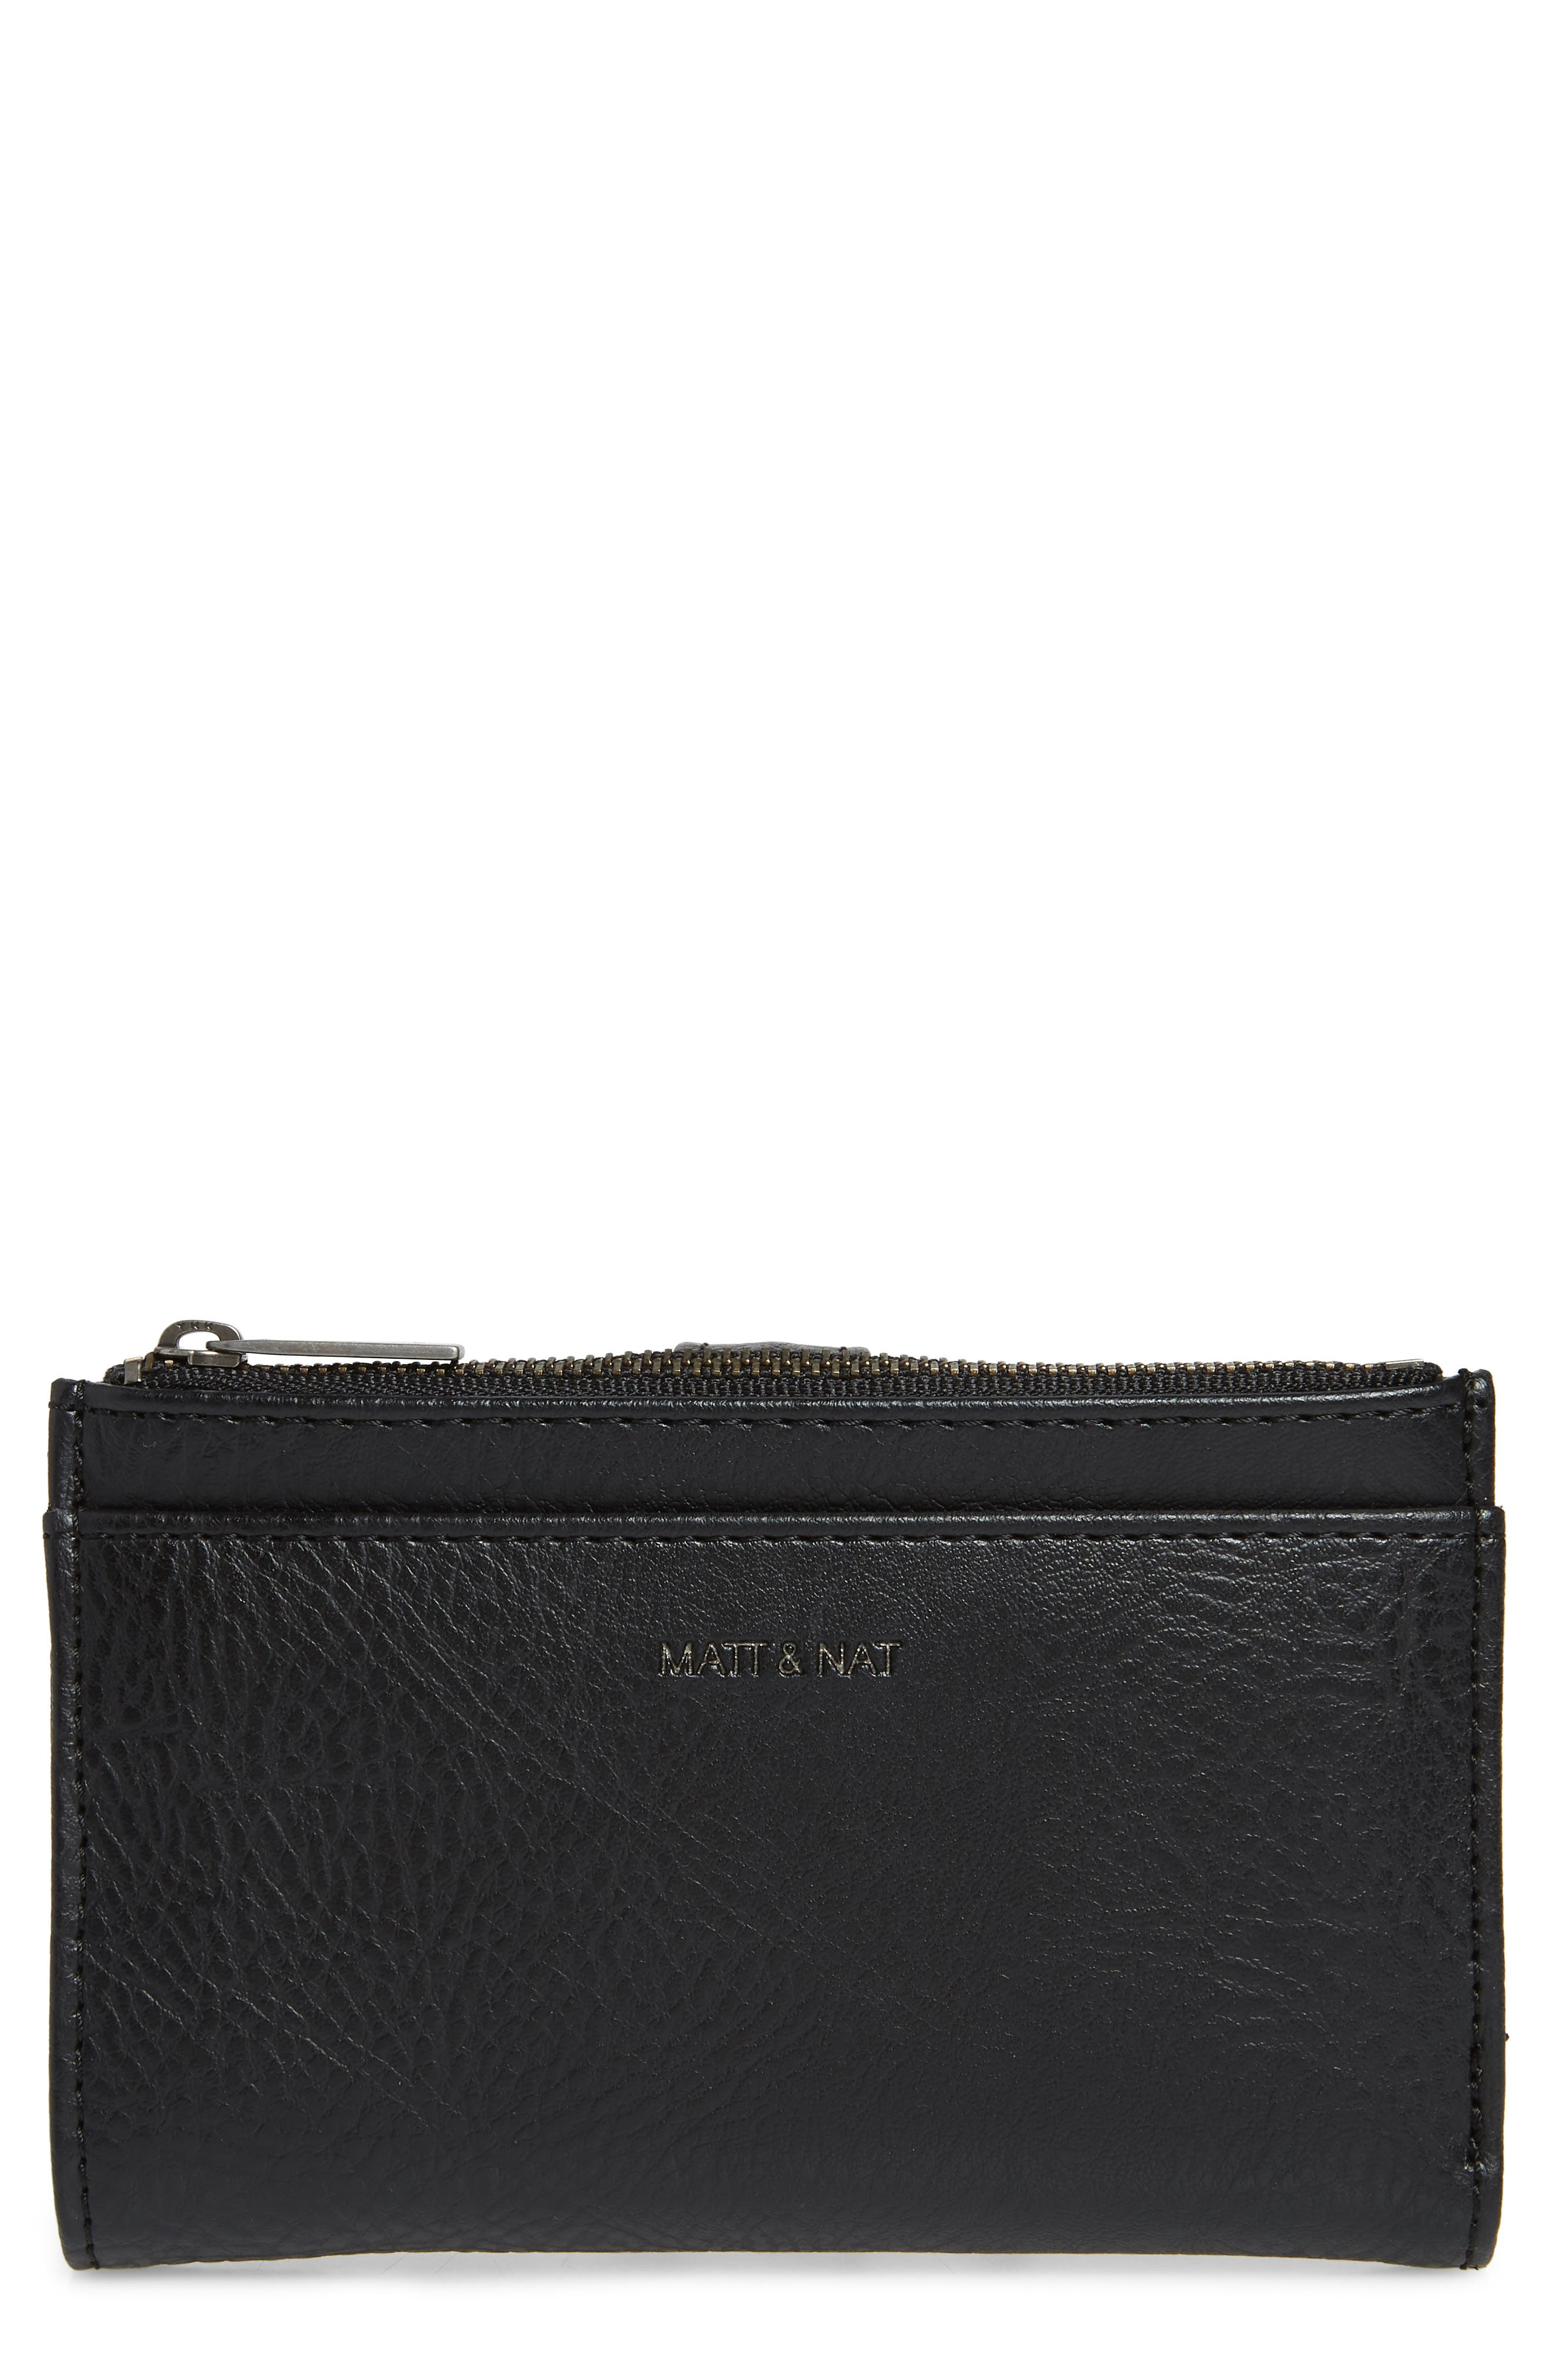 Matt & Nat Small Motiv Faux Leather Wallet - Black